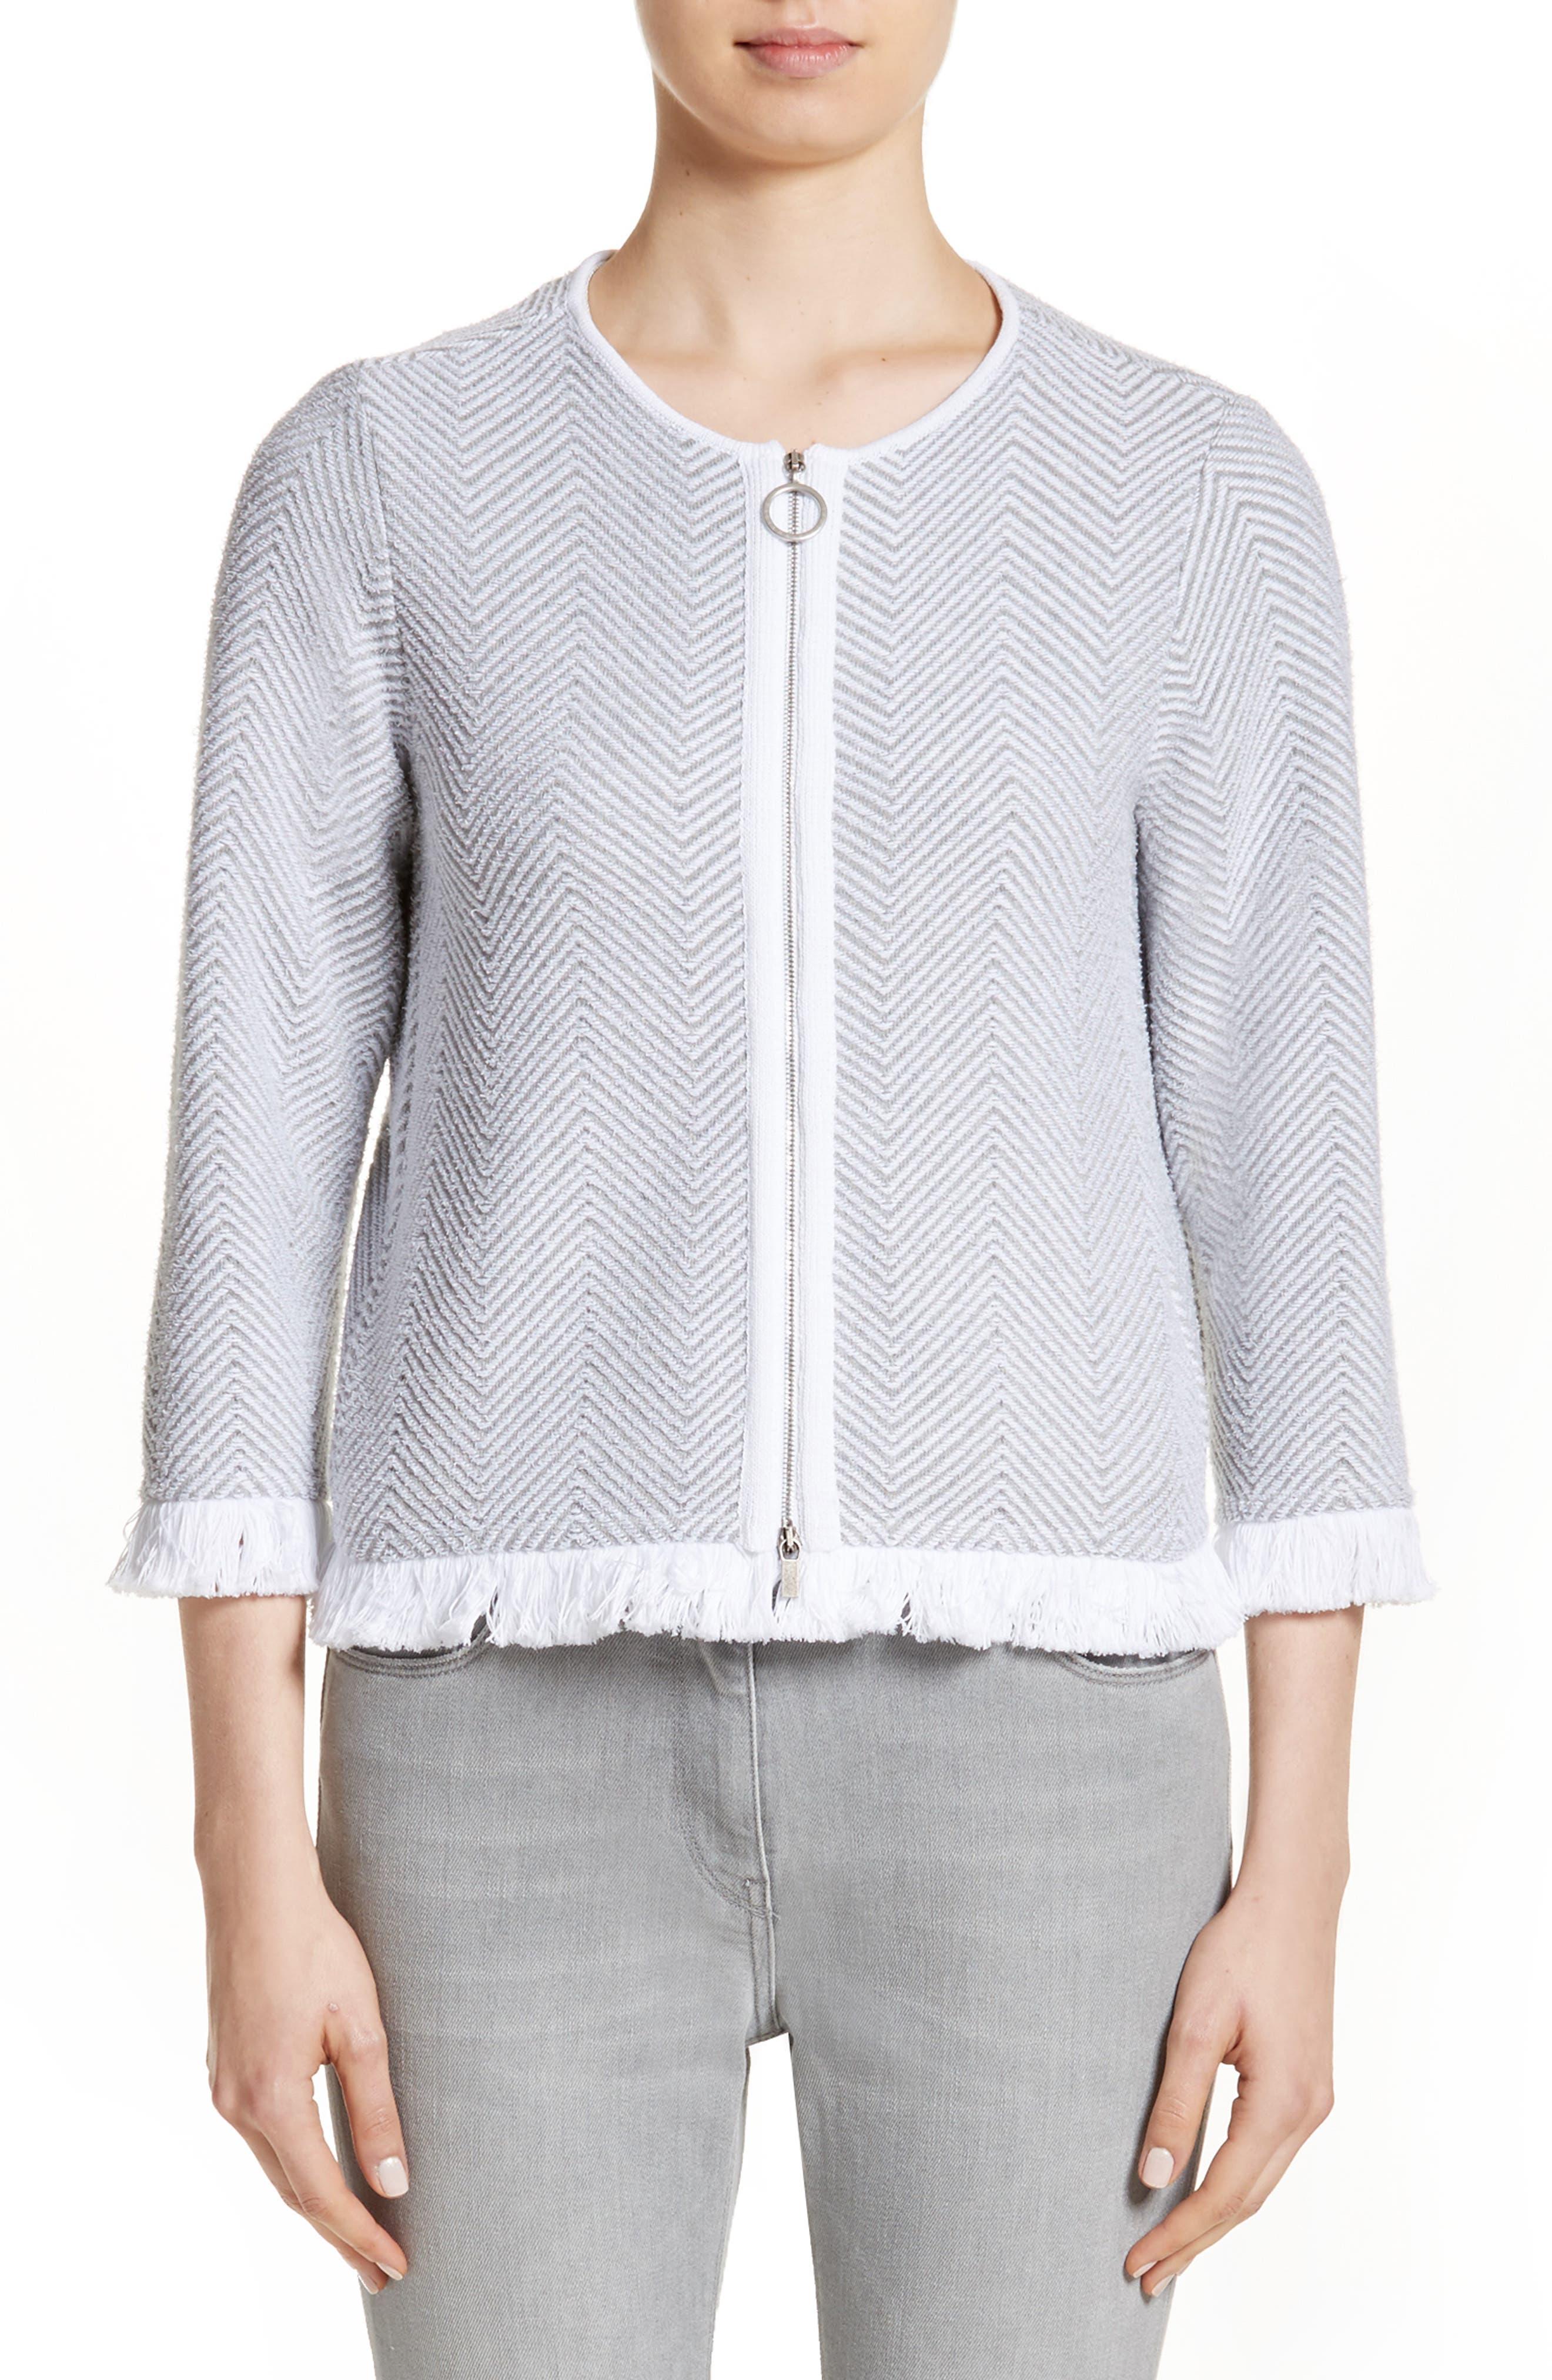 Chevron Knit Jacket,                             Main thumbnail 1, color,                             050